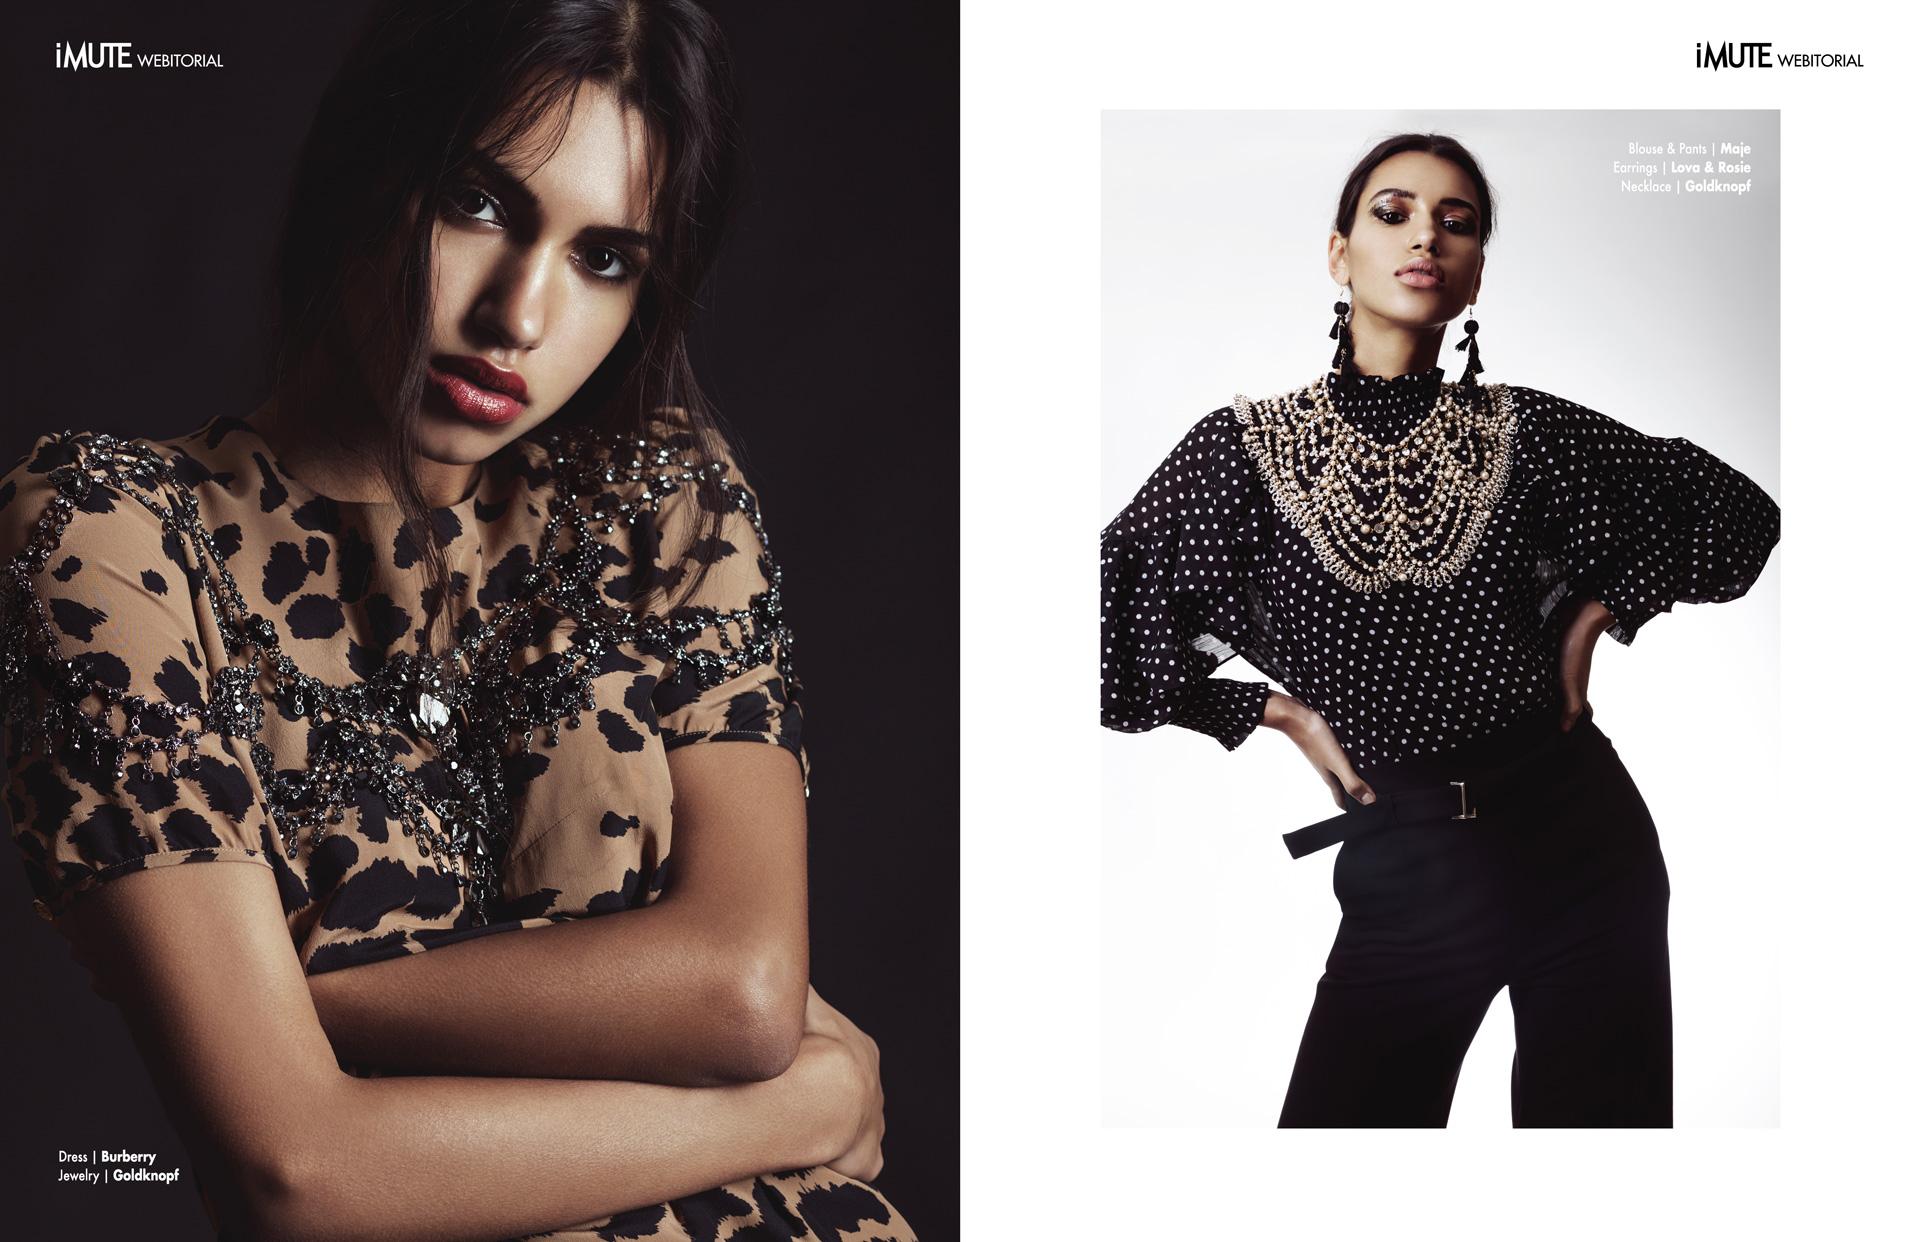 Chiara webitorial for iMute Magazine Photographer|Silke Schlotz @ Silke Photo Model| Chiara S. @Mega Models Stylist|Isabelle Barsch Makeup & Hair|Suzanna Santalab